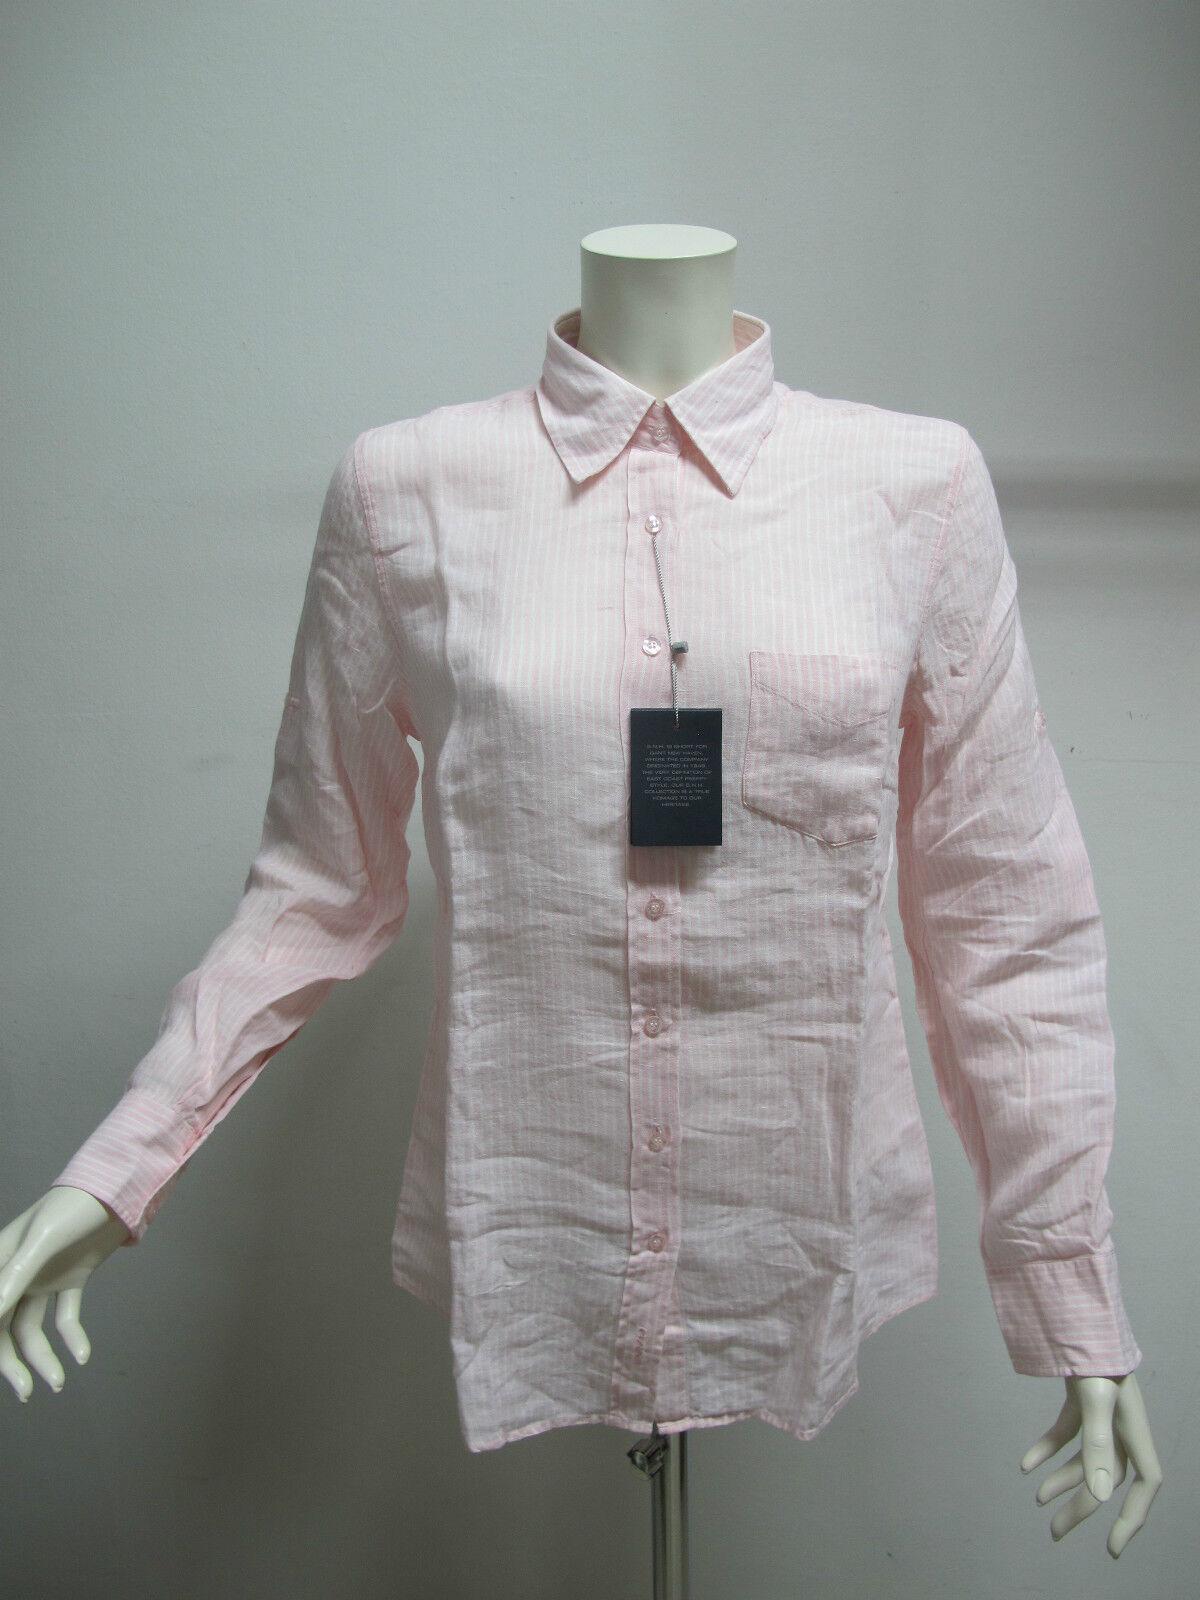 Gant Hemd Damen M   Lang Gestreift Art.430300 Farbe Rosa Weiß Größe 44 Sommer